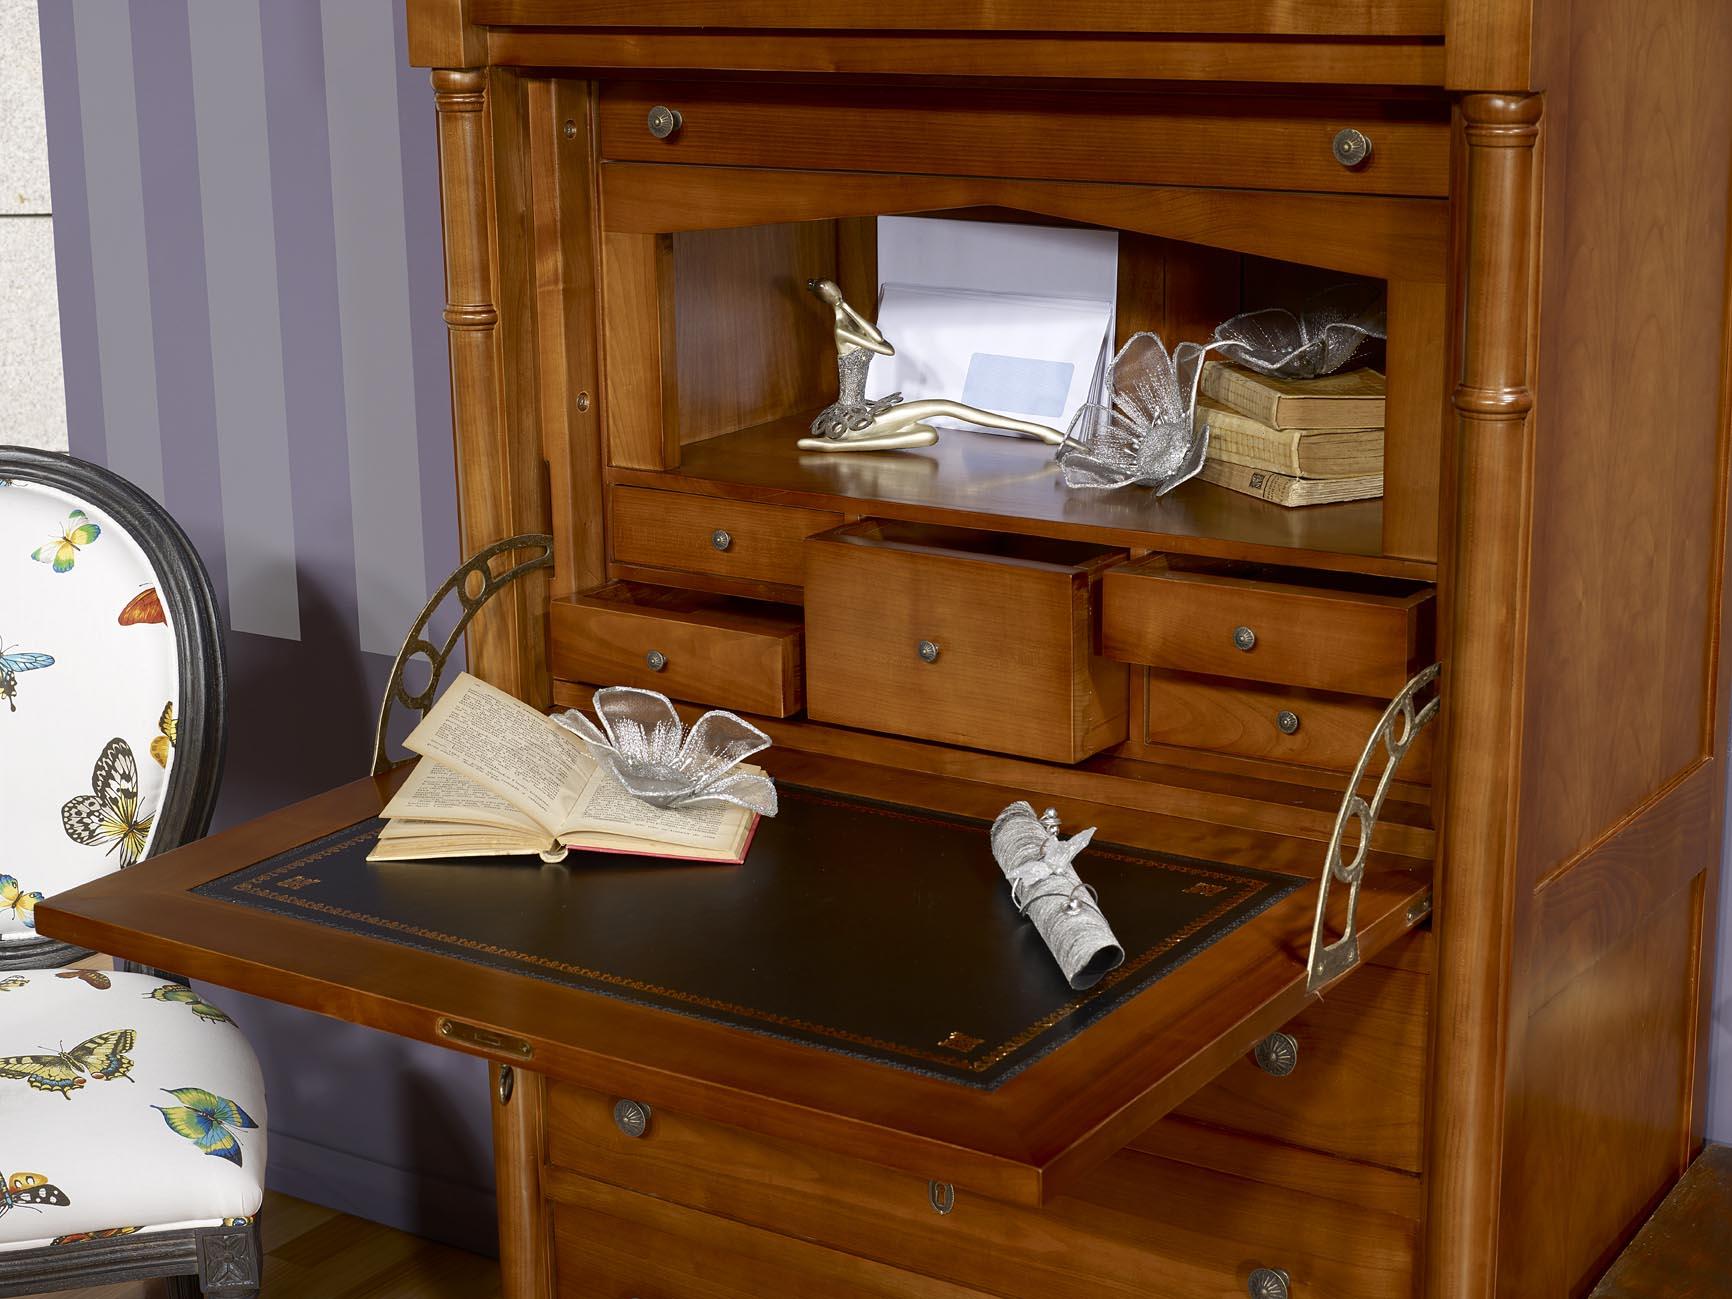 meuble secr taire elise en merisier de style empire meuble en merisier massif. Black Bedroom Furniture Sets. Home Design Ideas